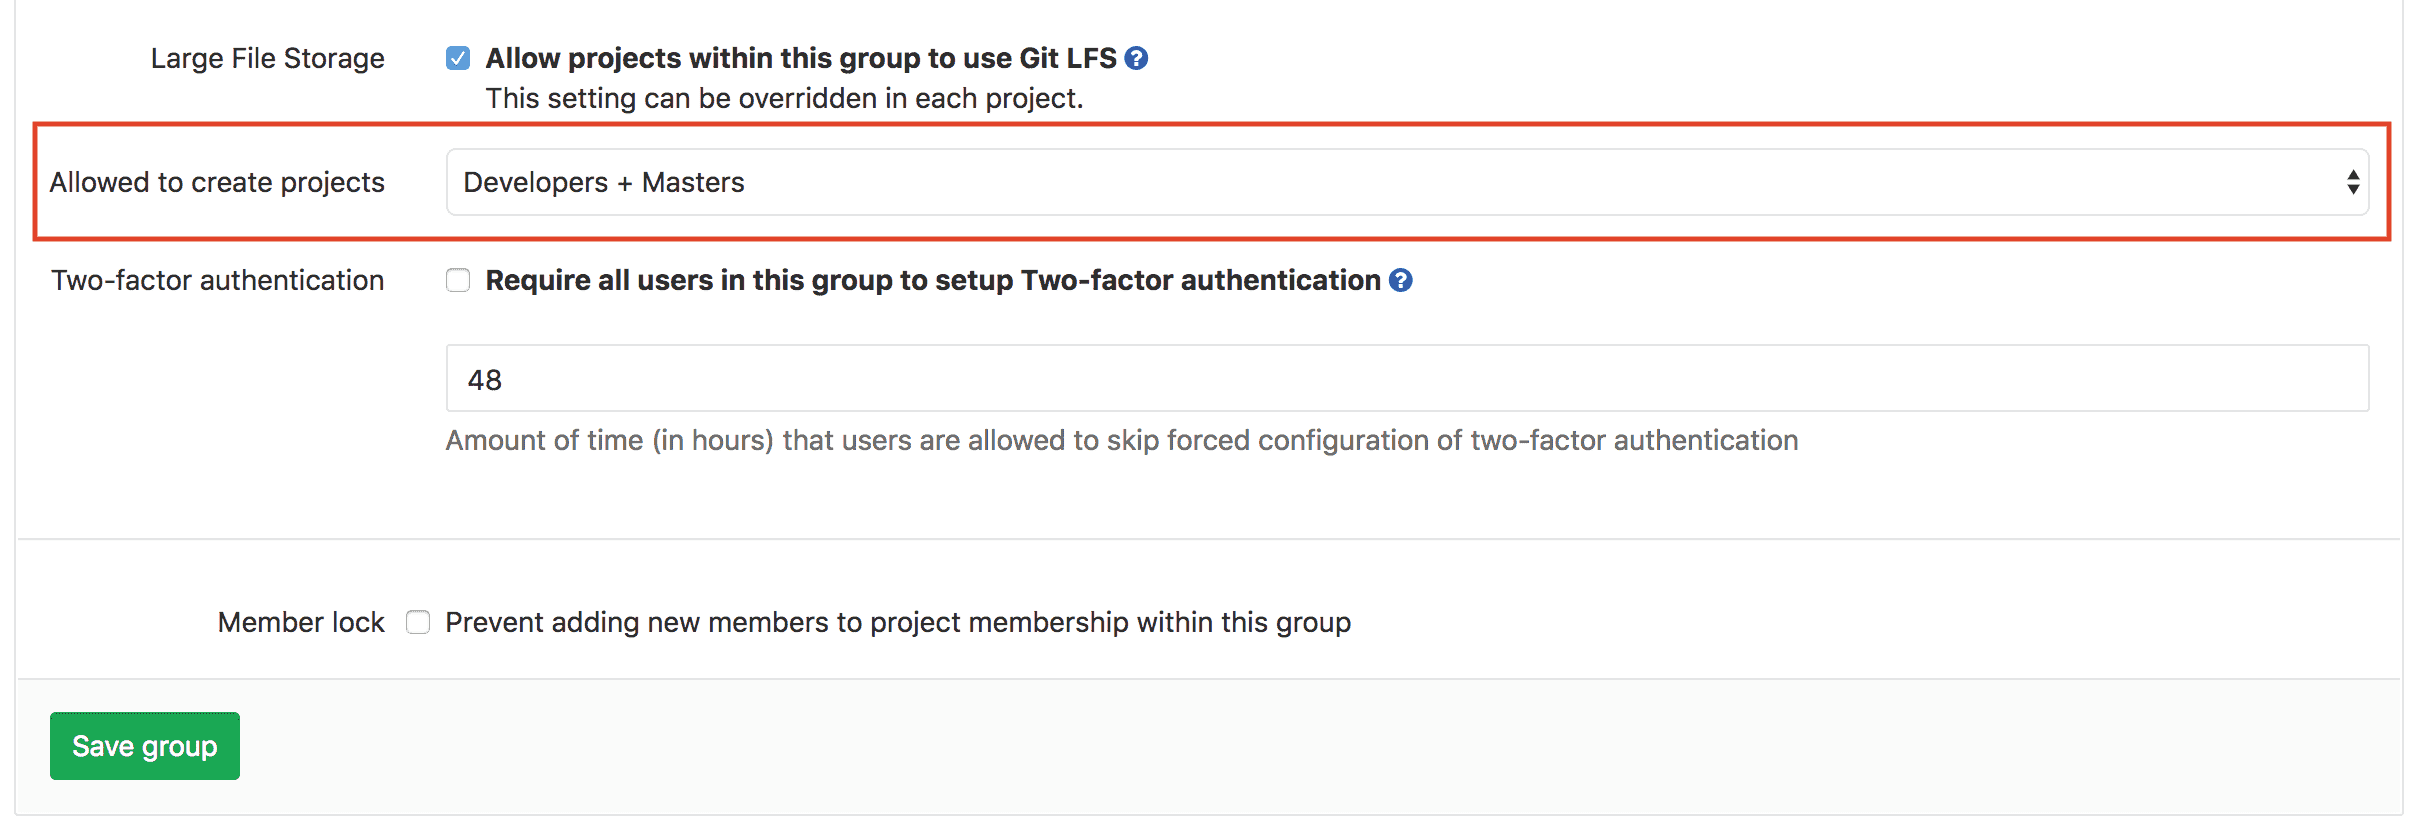 GitLab 10 5 released with Let's Encrypt integration